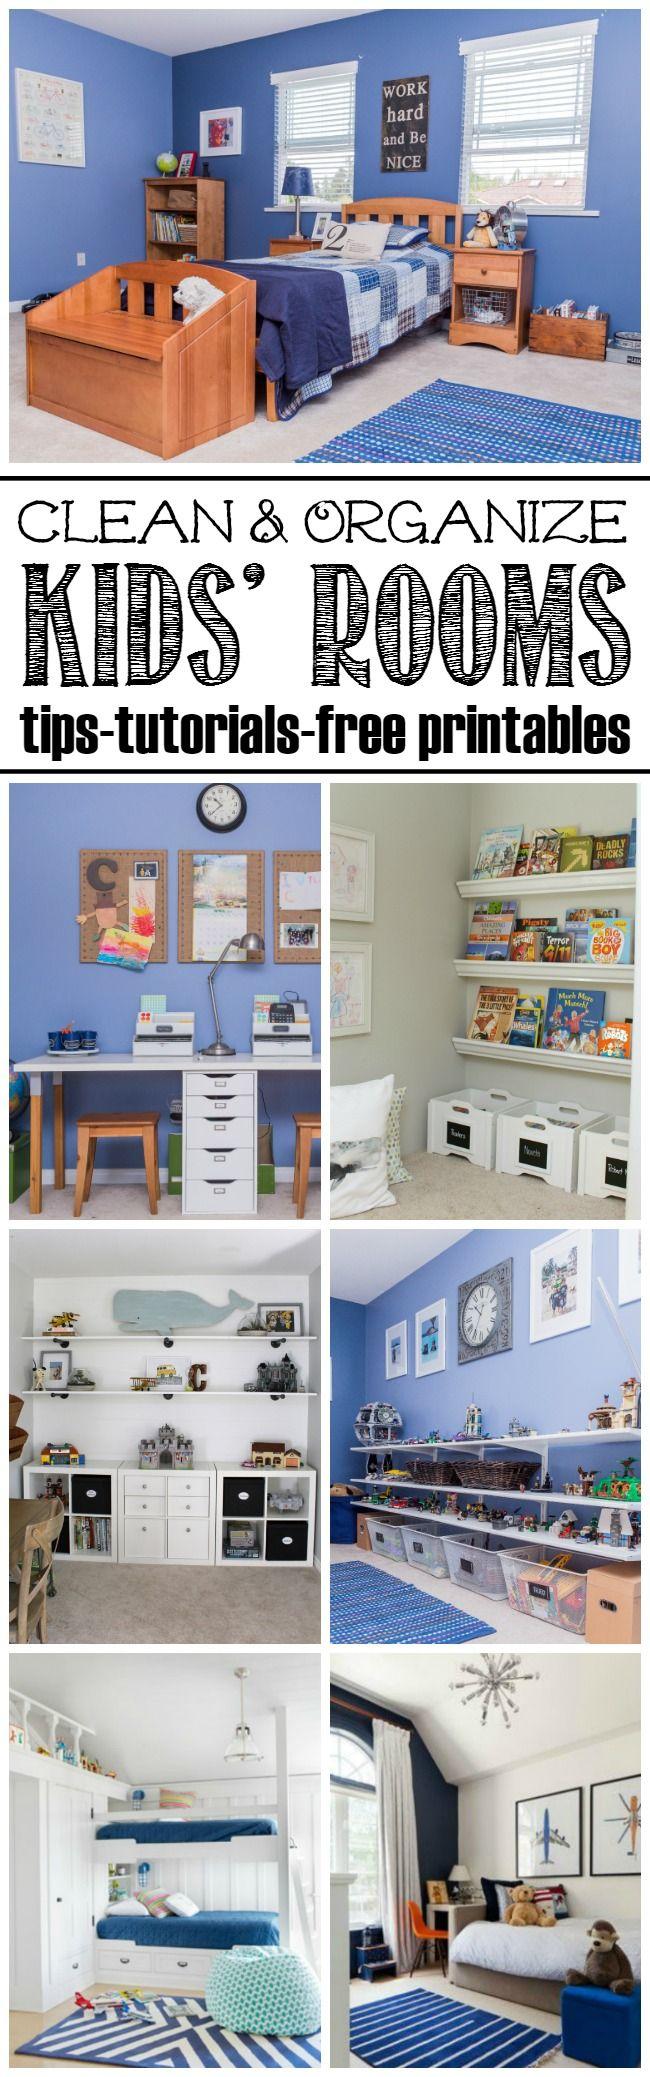 25 best ideas about kid bedrooms on pinterest kids bedroom cool kids beds and kids bedroom storage - Bedroom Ideas Kids